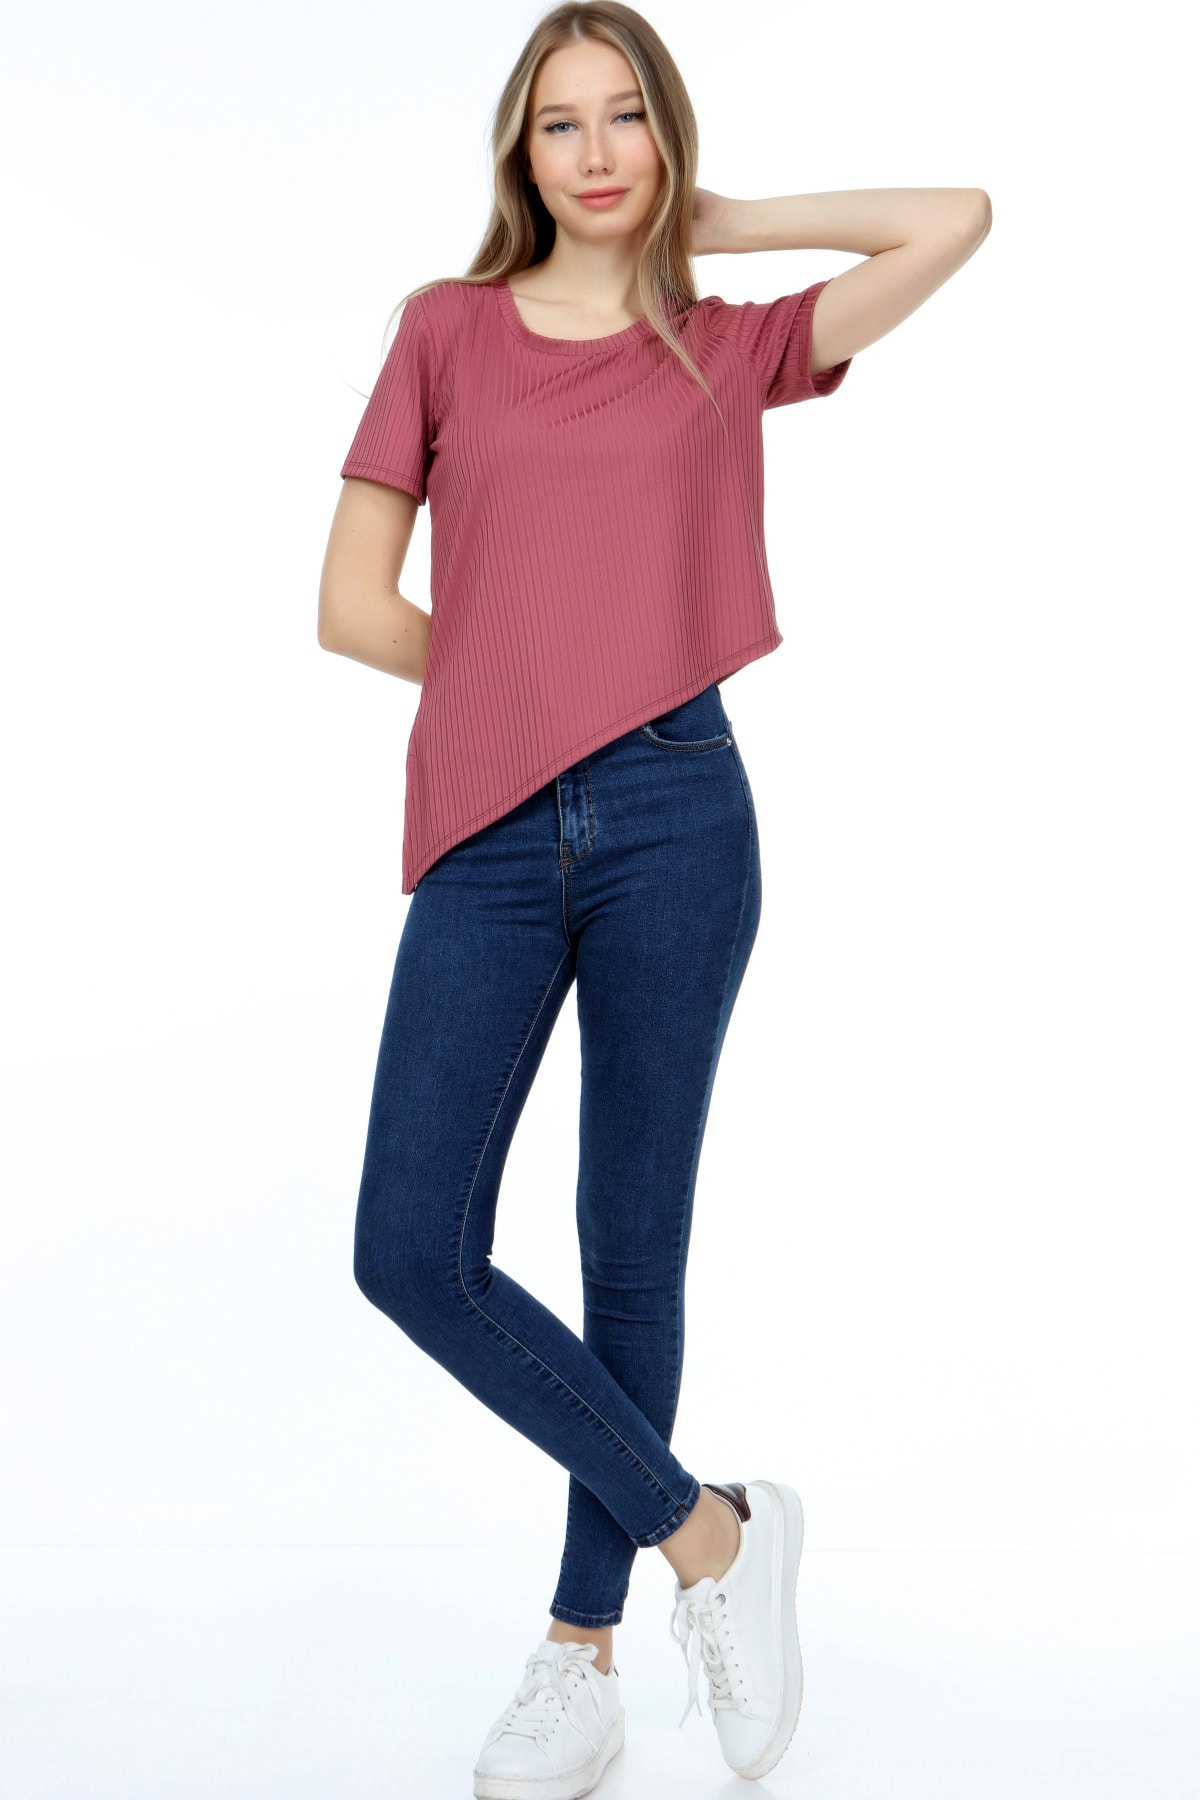 AKDEM GROUP Kadın Pembe Çapraz Crop T-Shirt 1